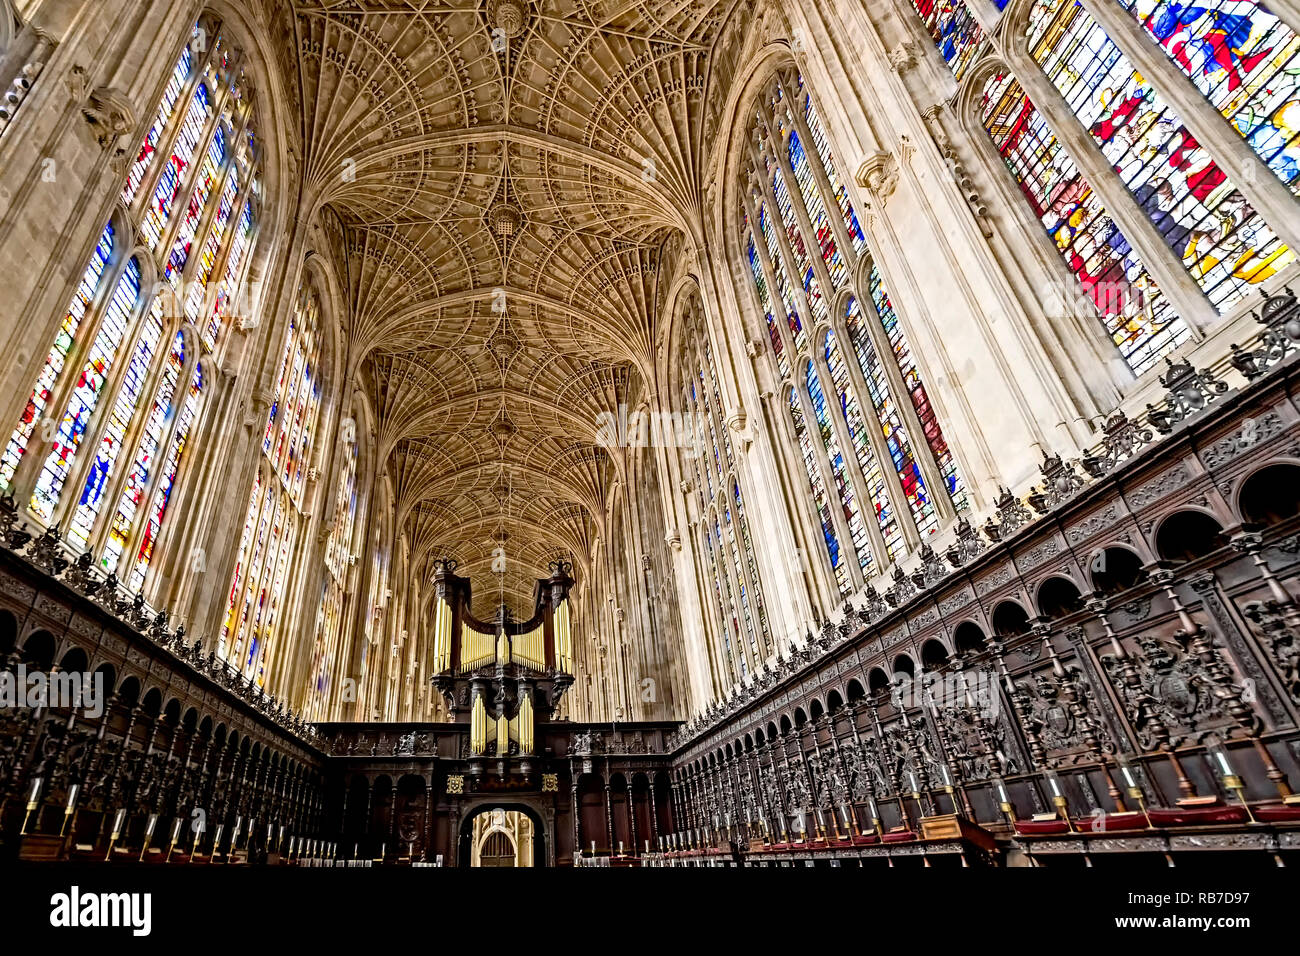 King's College (Cambridge, England) Stock Photo